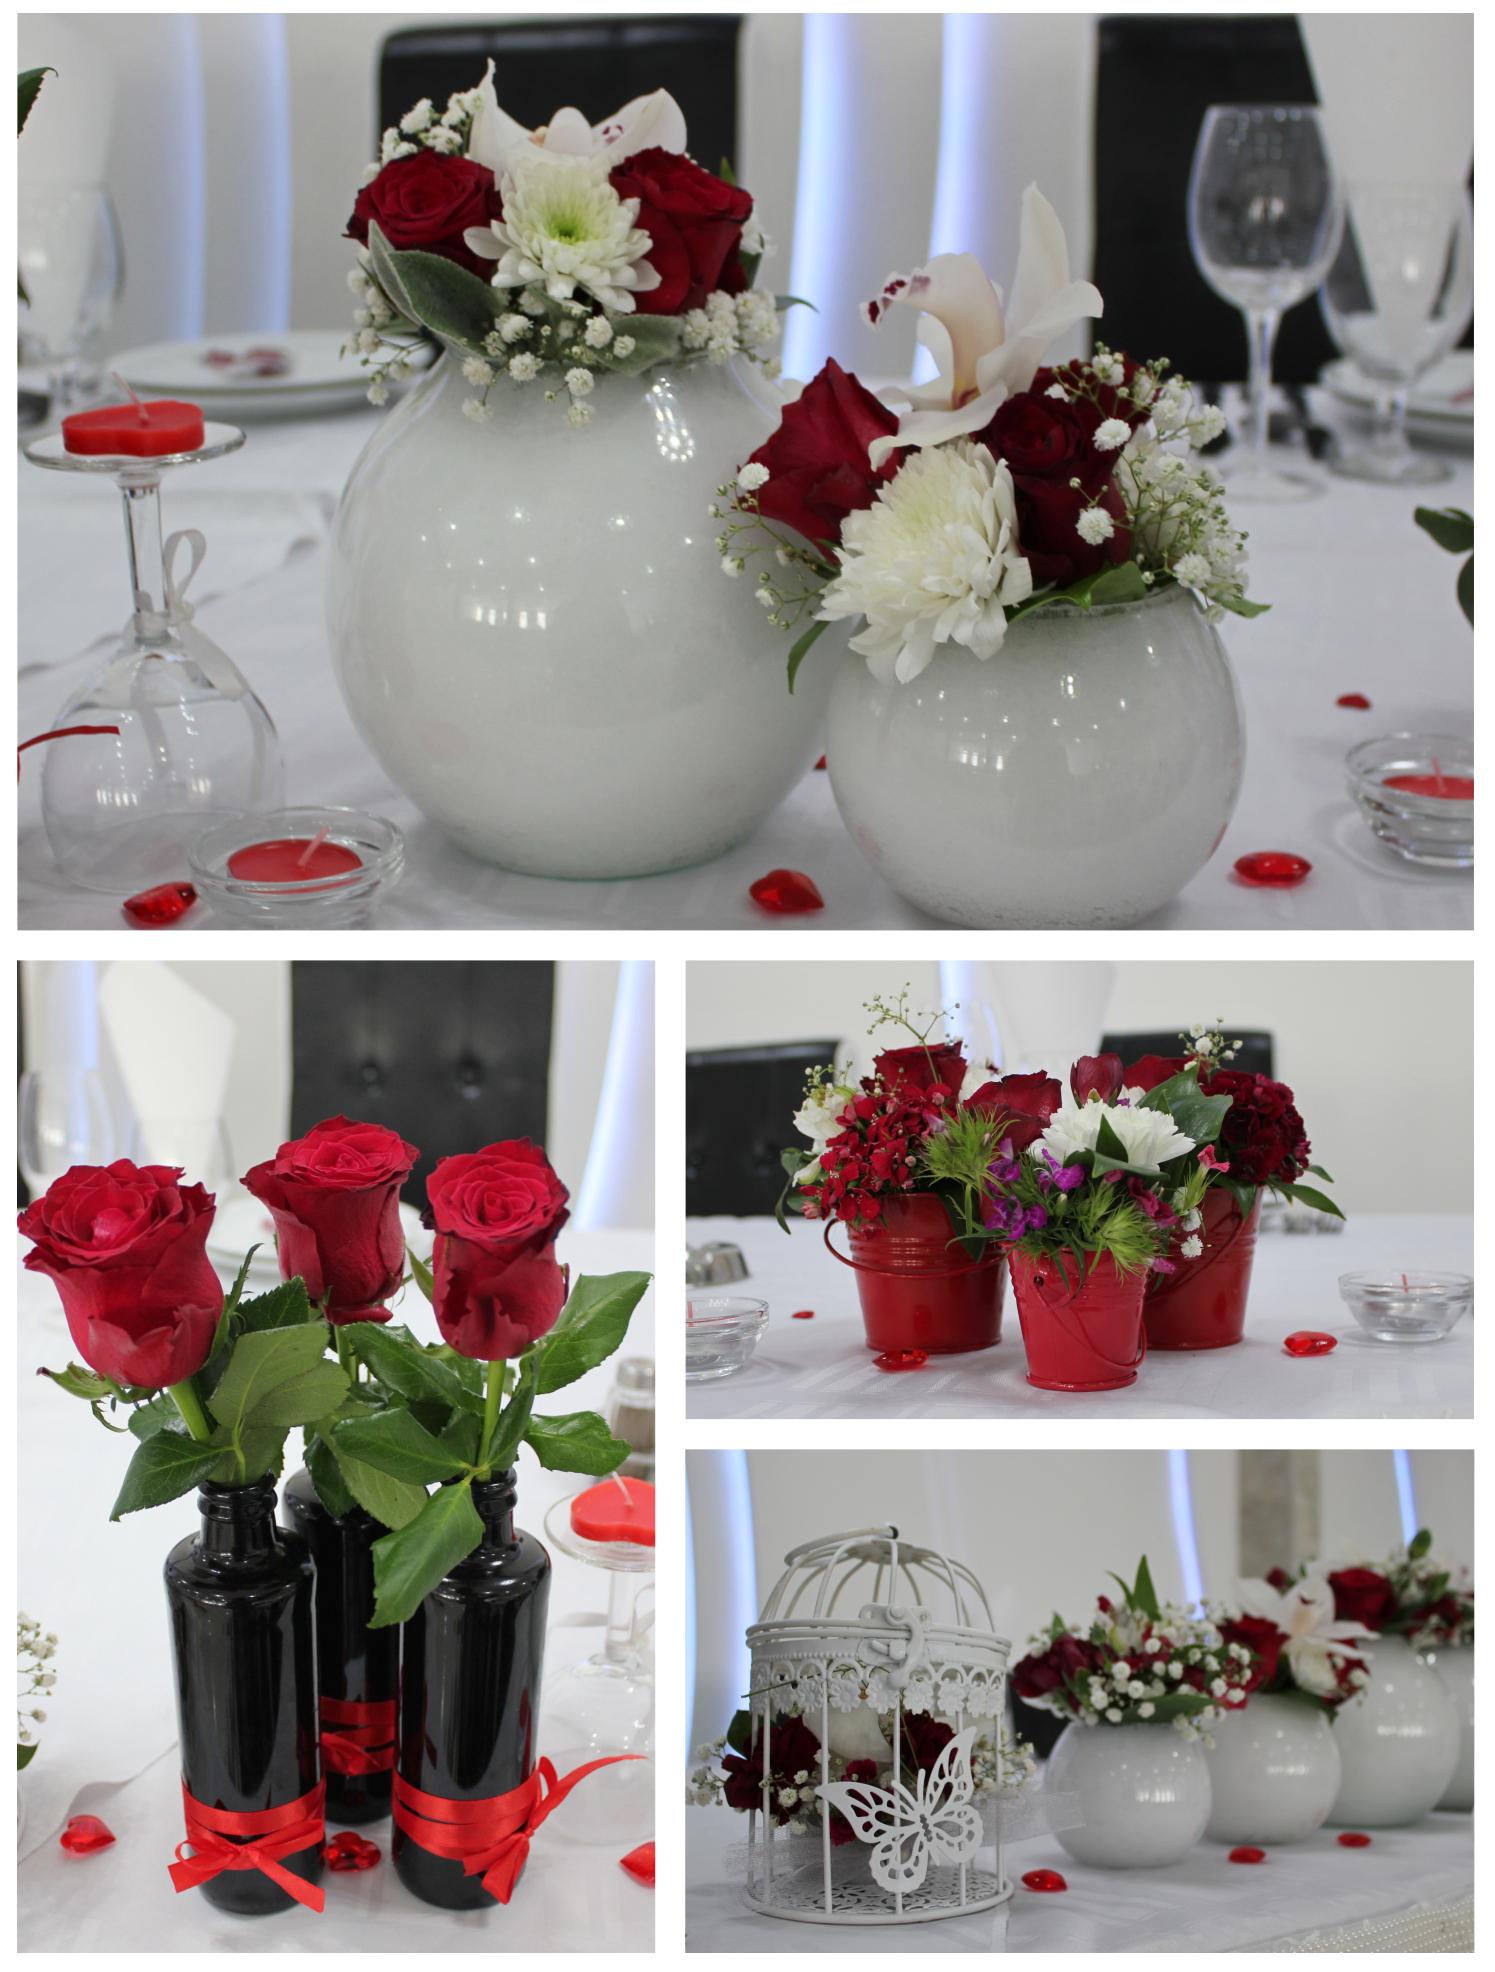 gagorigami-svadbaivencanje-dekoracija